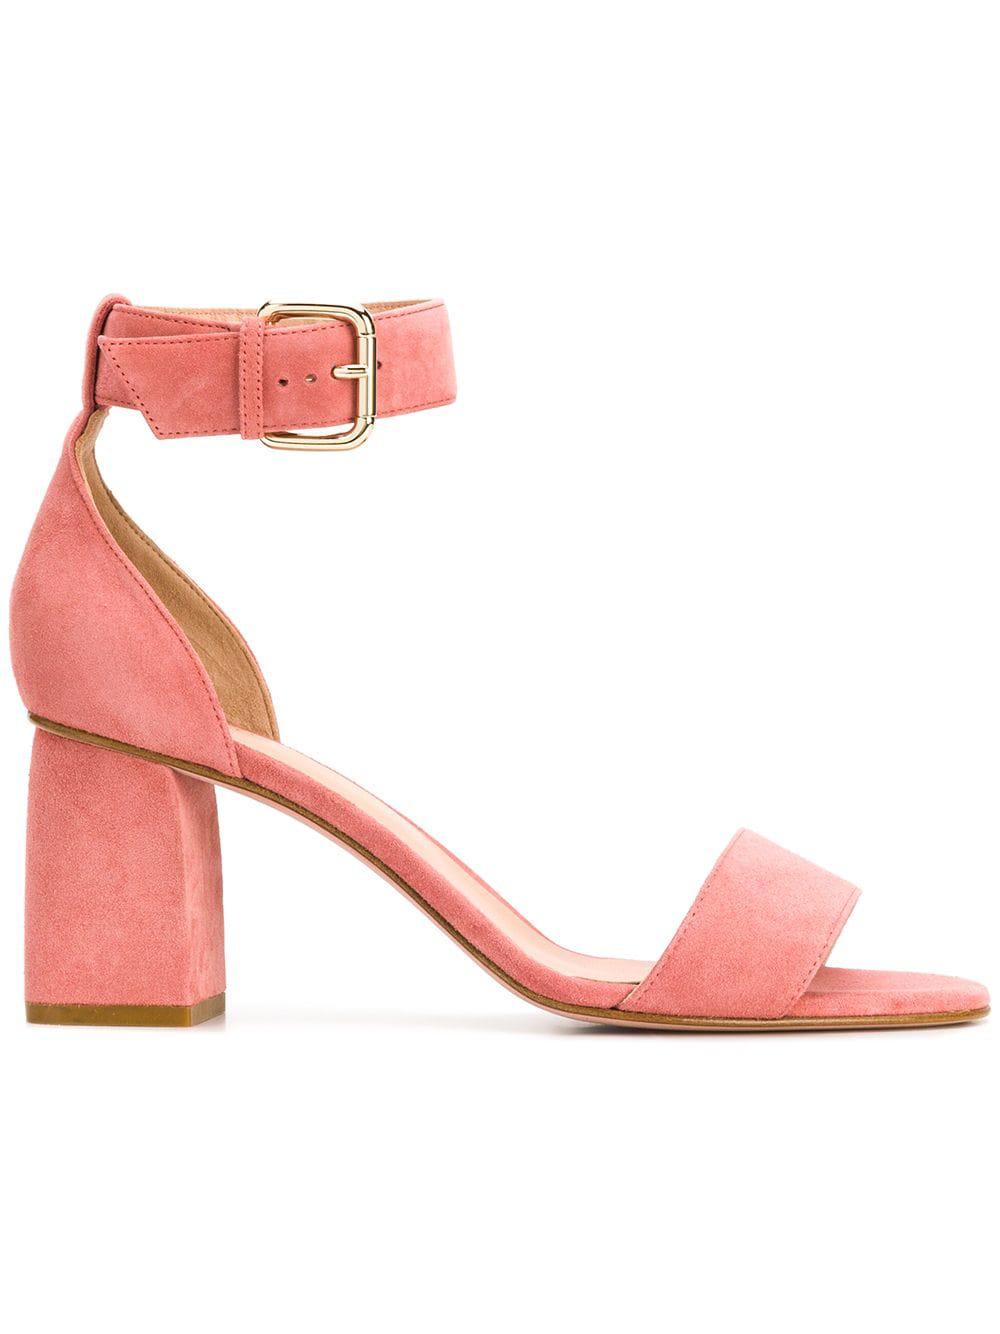 3e97f26f0876 Red Valentino Block Heel Sandals - Pink